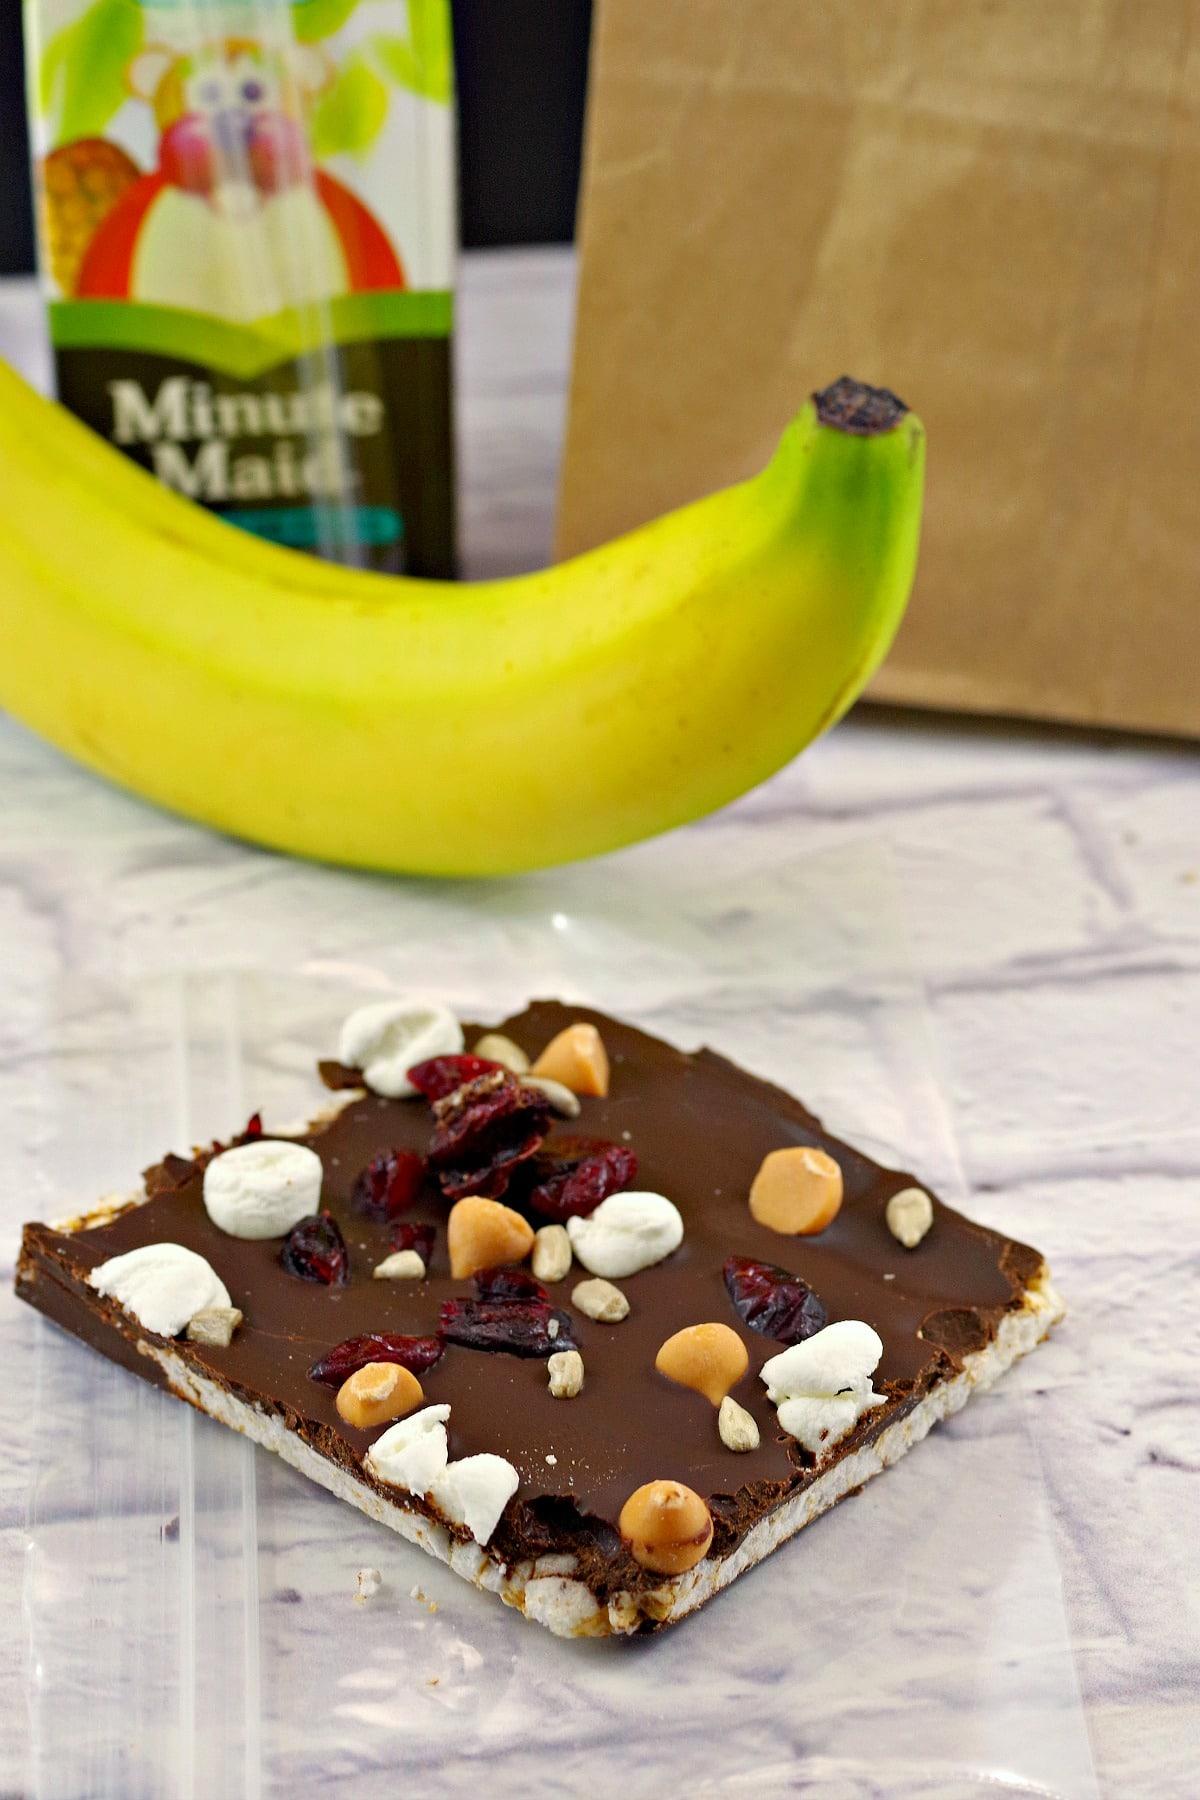 Healthy No Bake Chocolate Dessert - Rocky Road Bar #wwrecipes #healthychocolate